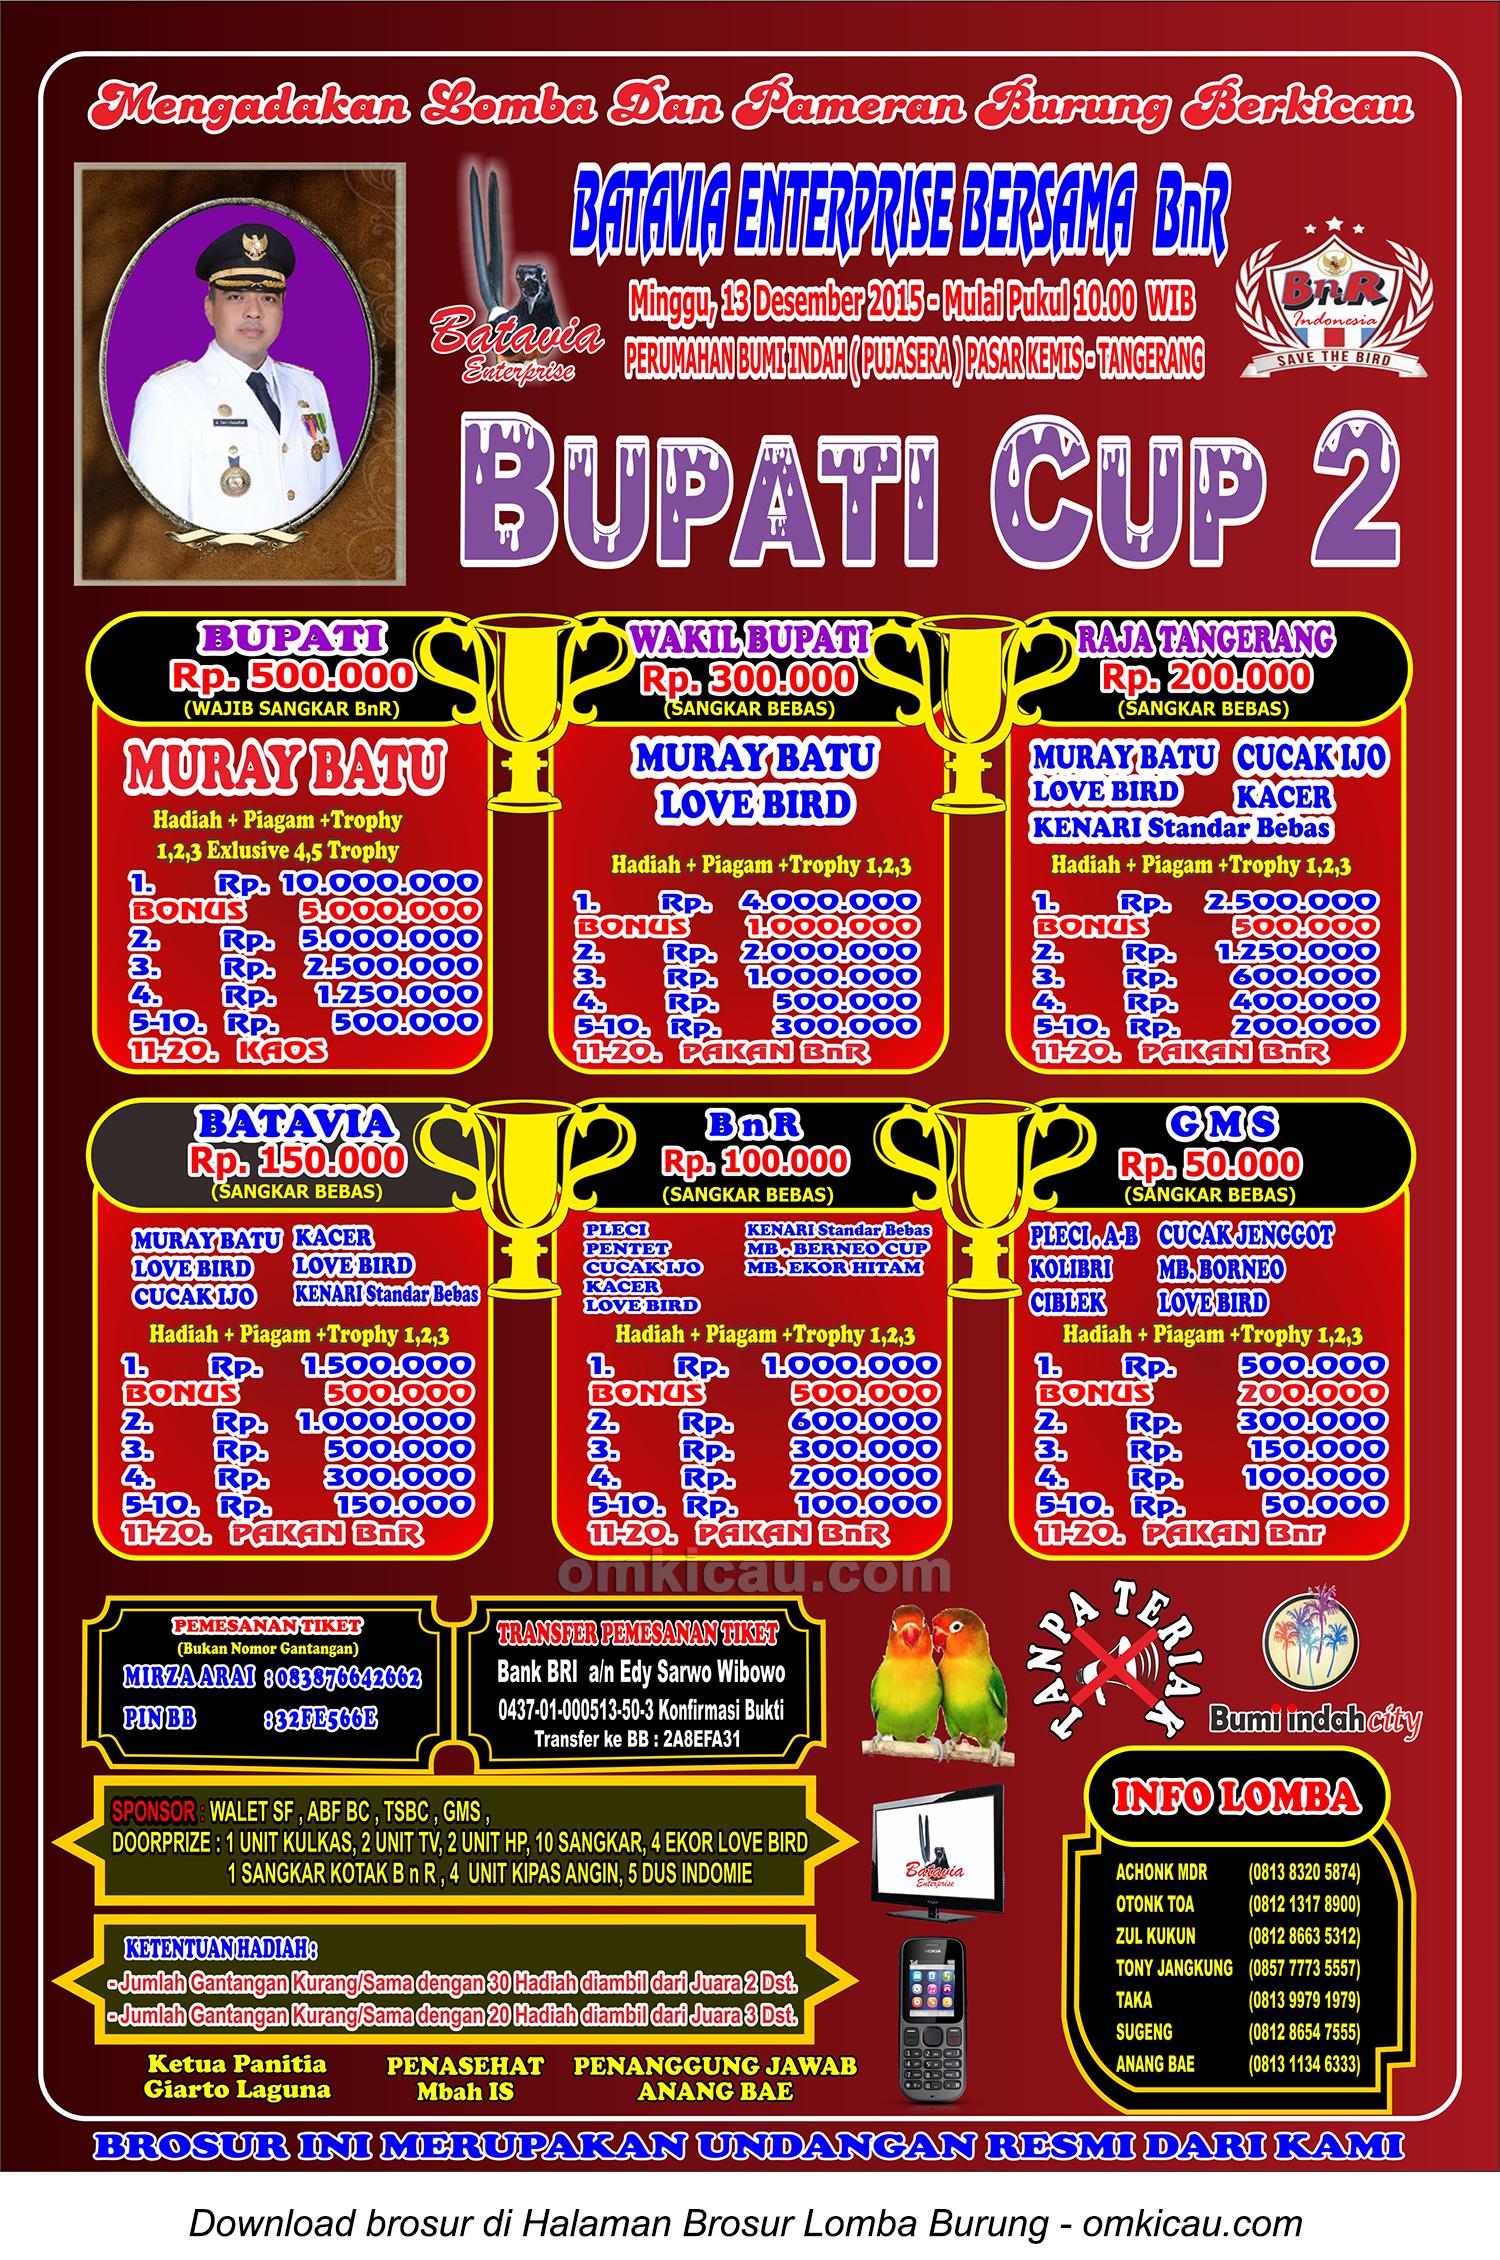 Brosur Lomba Burung Berkicau Bupati Cup 2, Tangerang, 13 Desember 2015